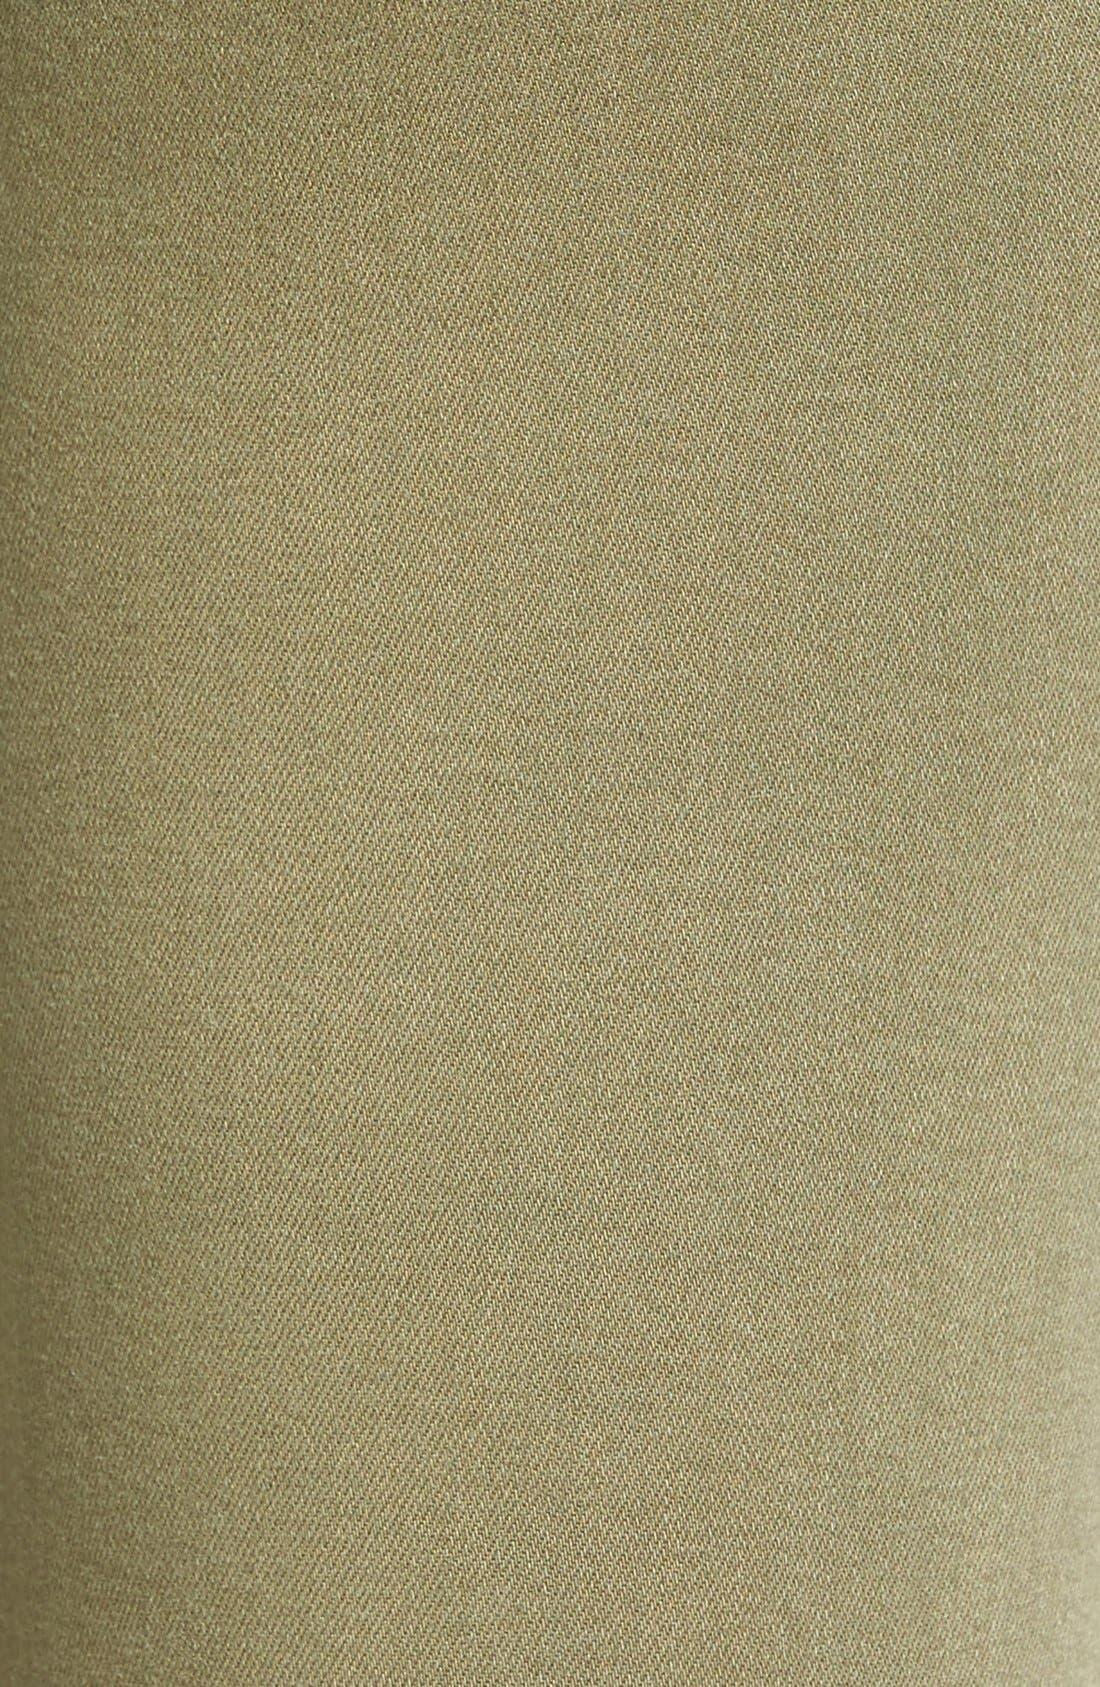 Alternate Image 4  - PAIGE Transcend - Verdugo Ankle Skinny Jeans (Sahara Green)